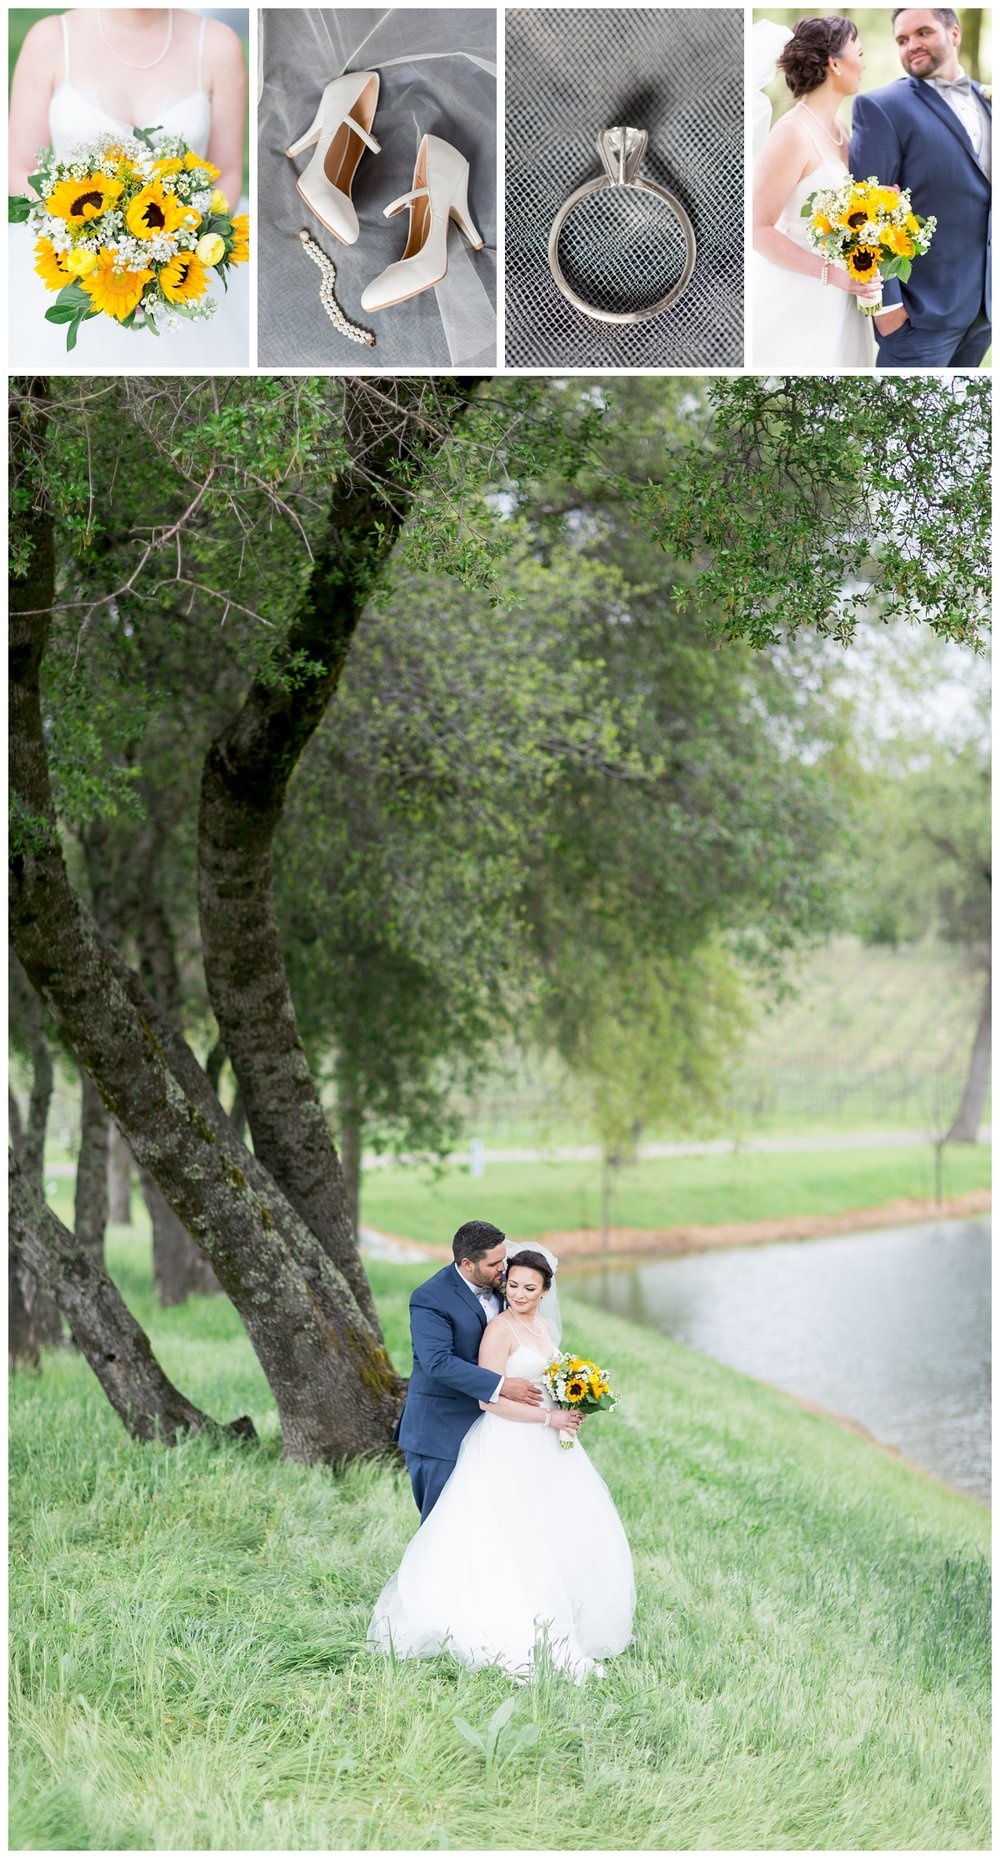 Castle-Vineyards-Wedding-Photos_4550-1.jpg